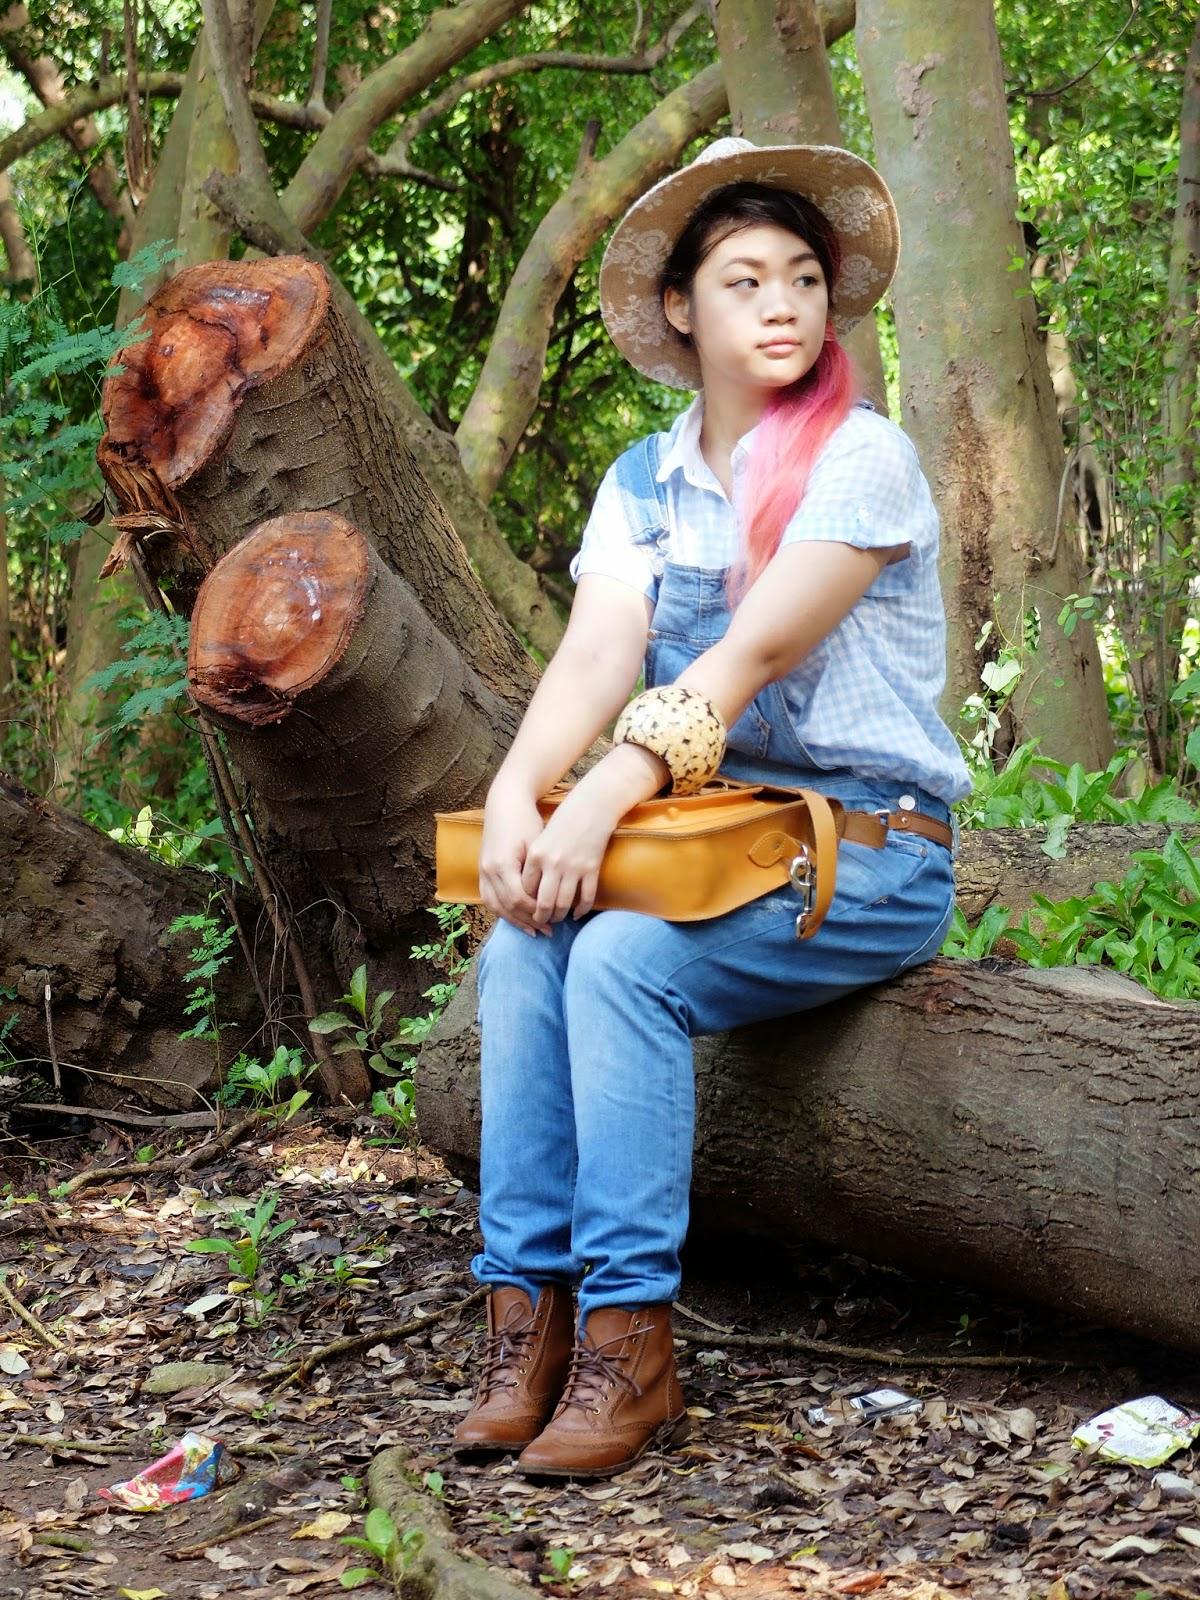 eco park, stradivarius boots